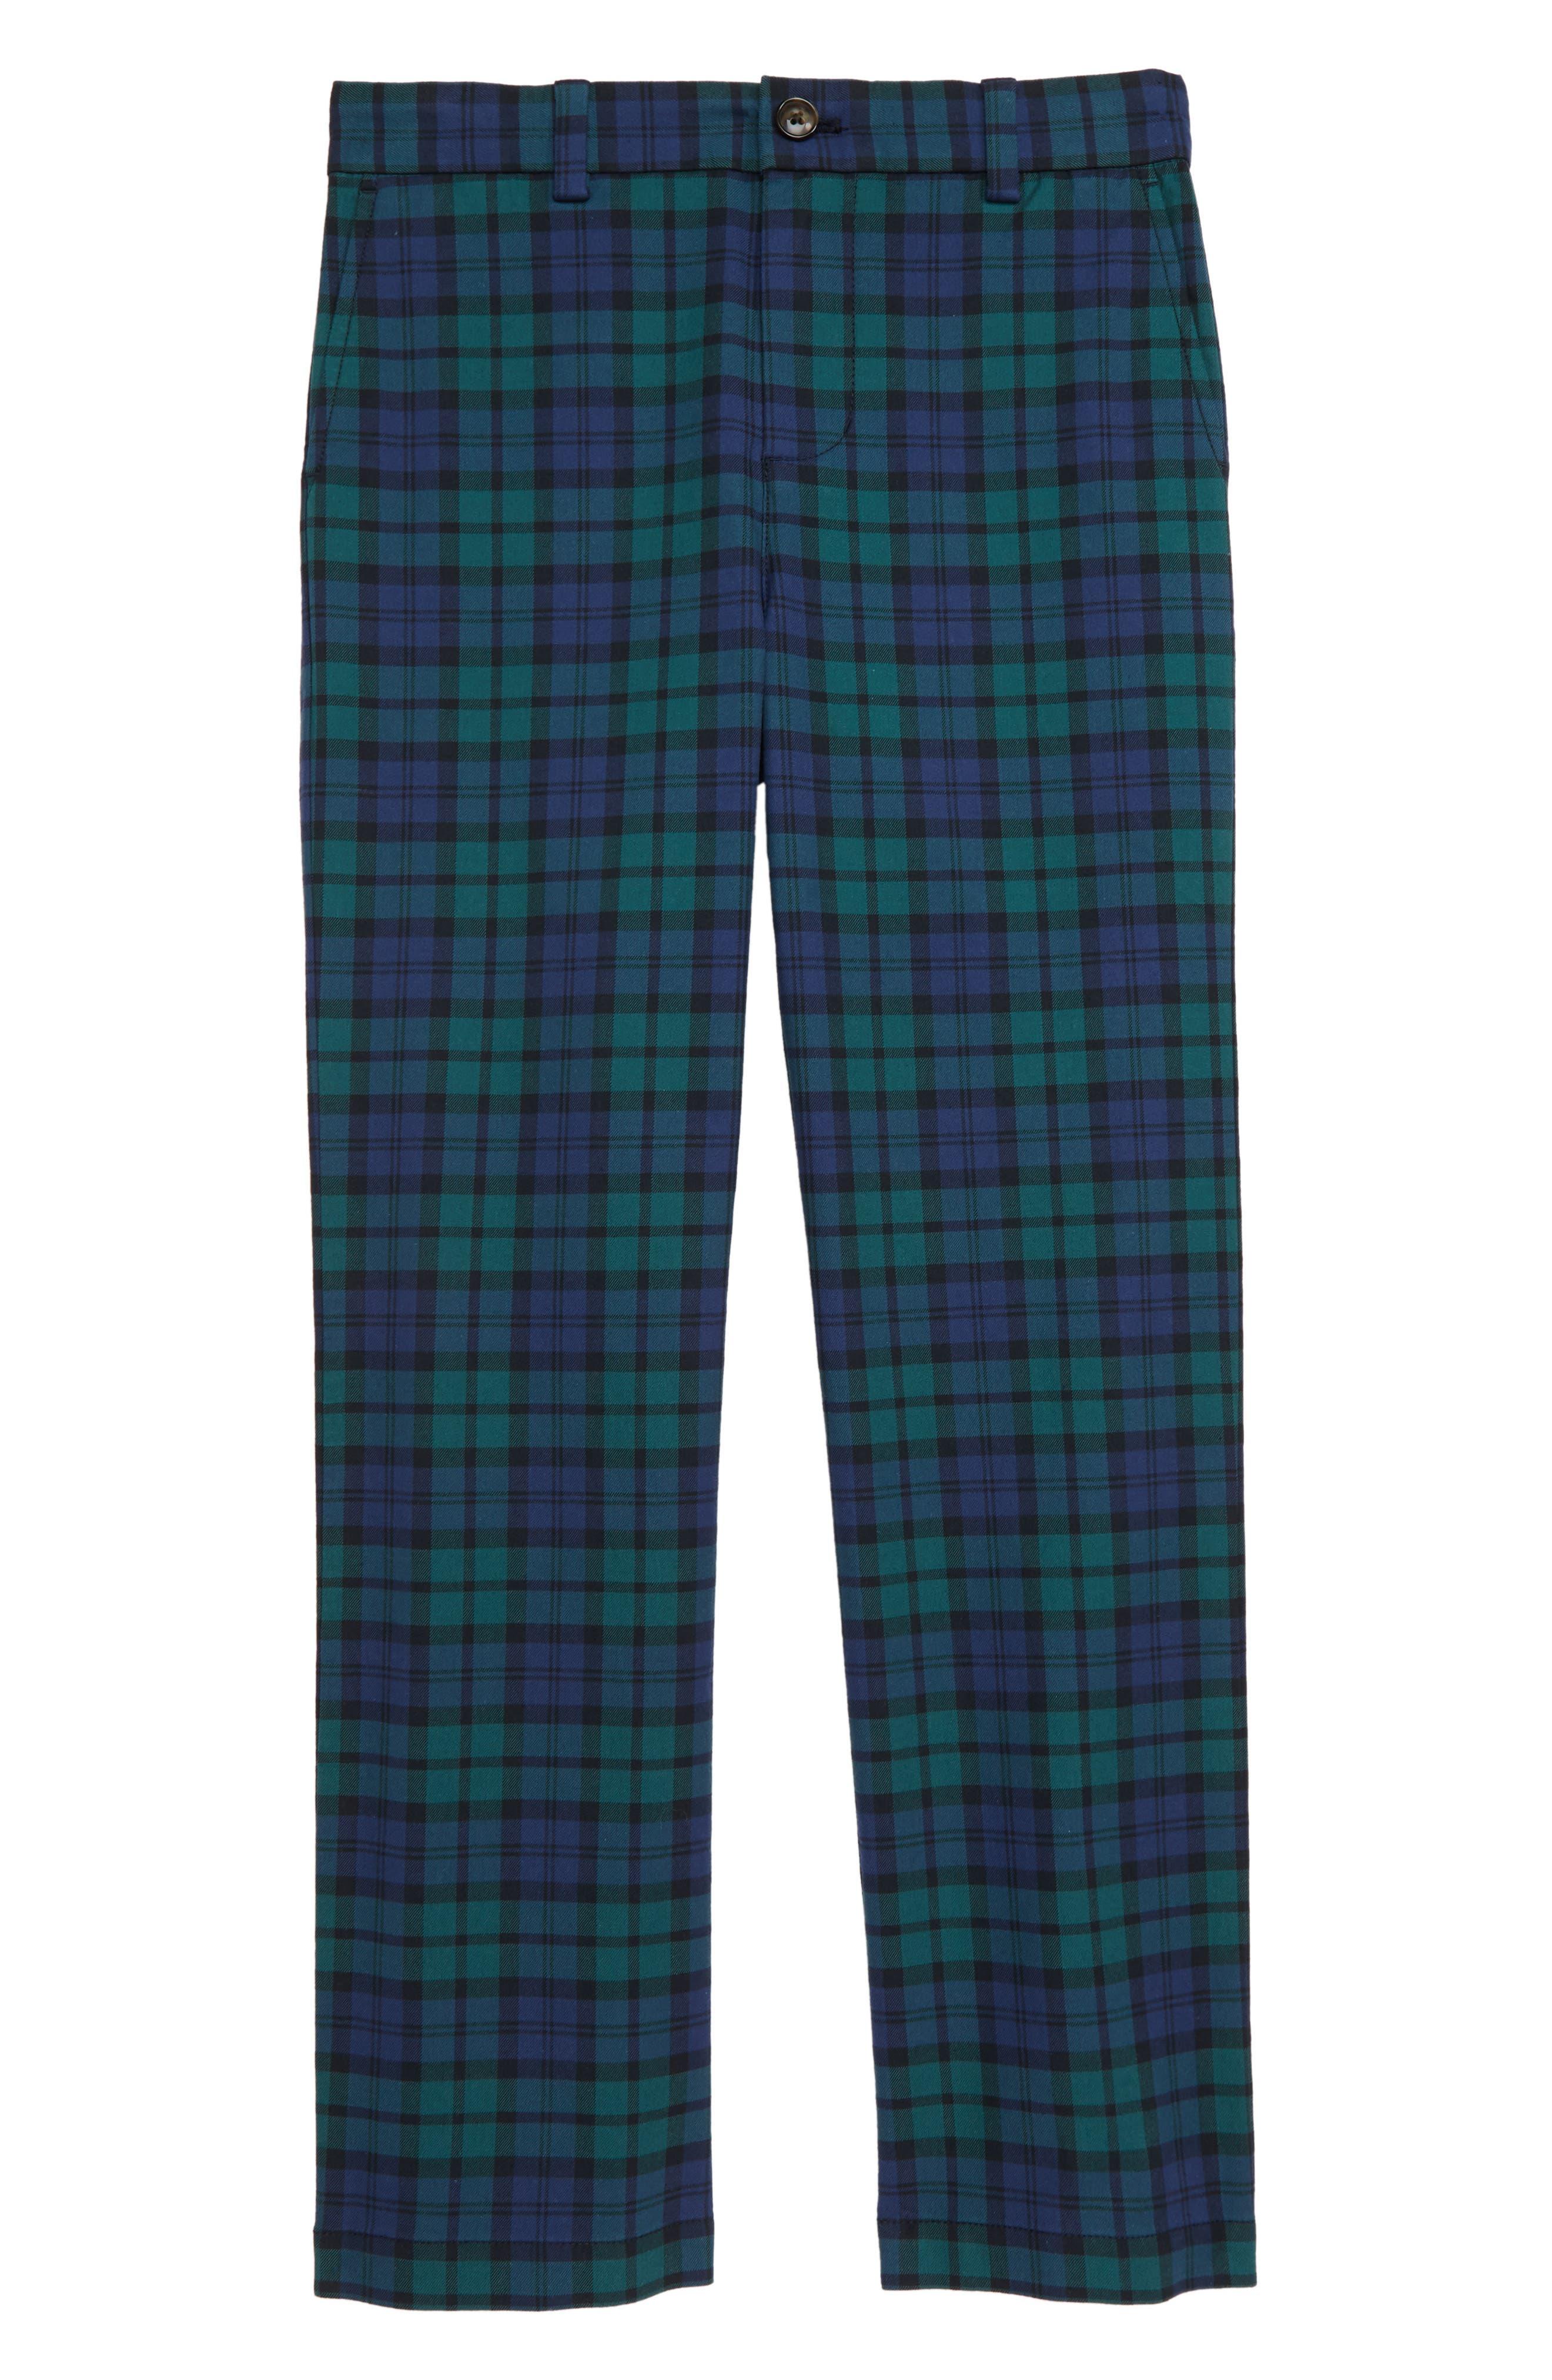 Boys Vineyard Vines Breaker Pants Size 10  Blue